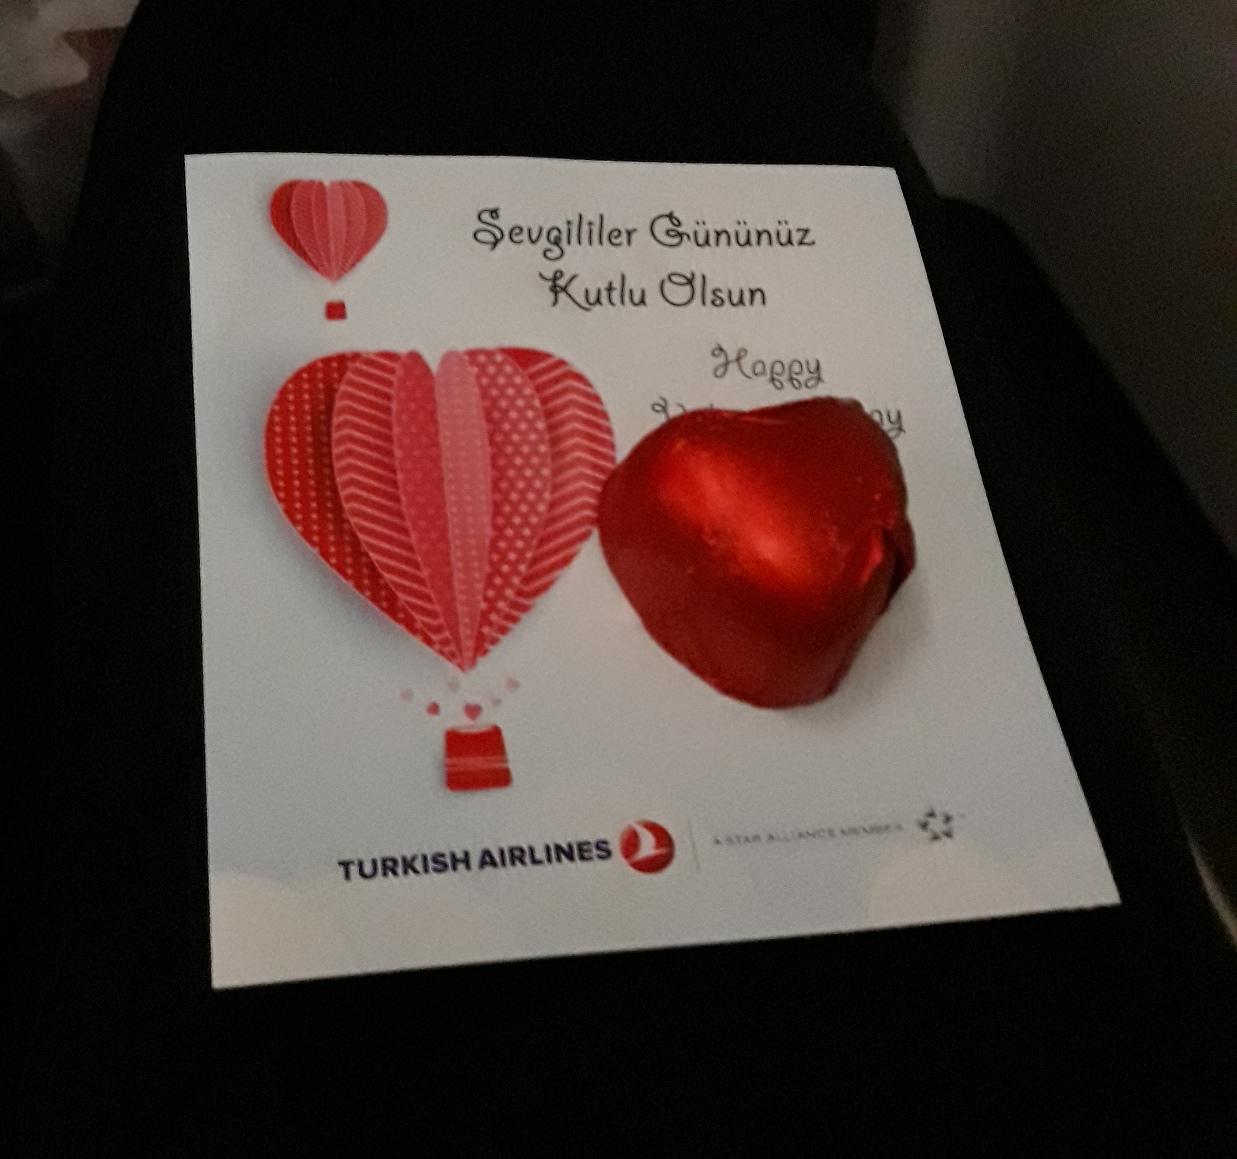 Валентинка от турецких авиалиний